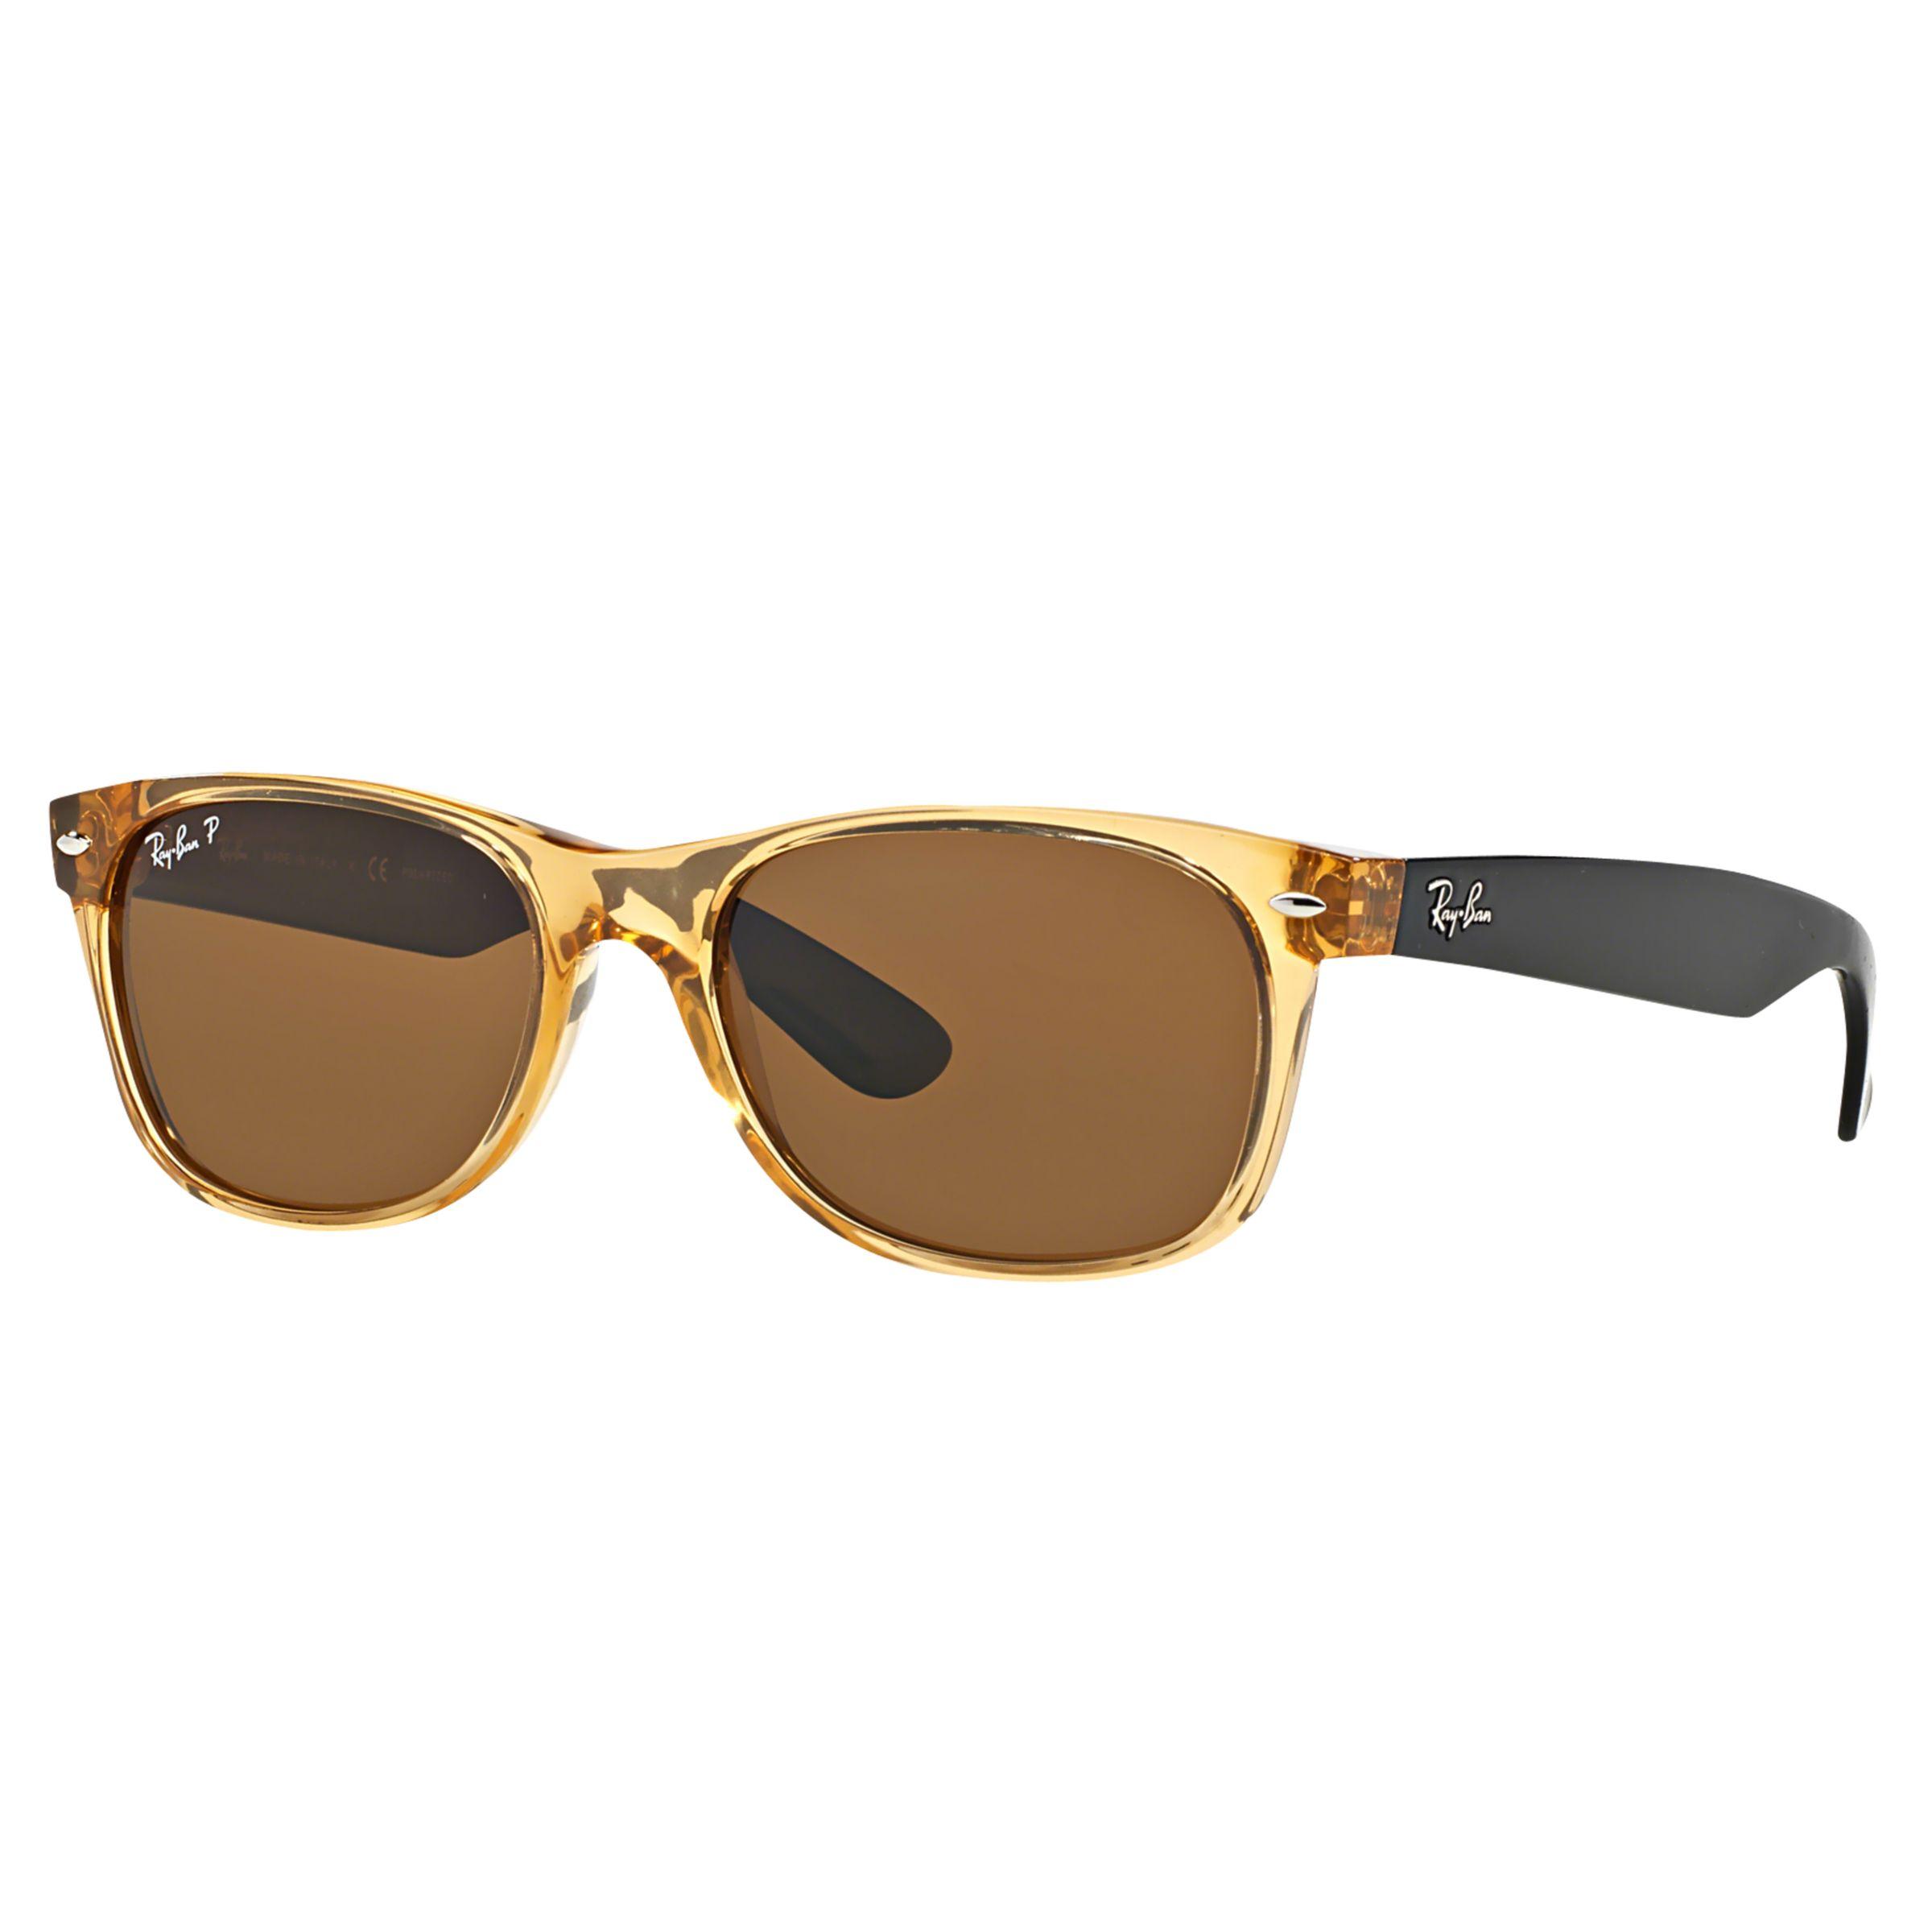 c40b6cc60a Ray-Ban RB2132 New Wayfarer Polarised Sunglasses